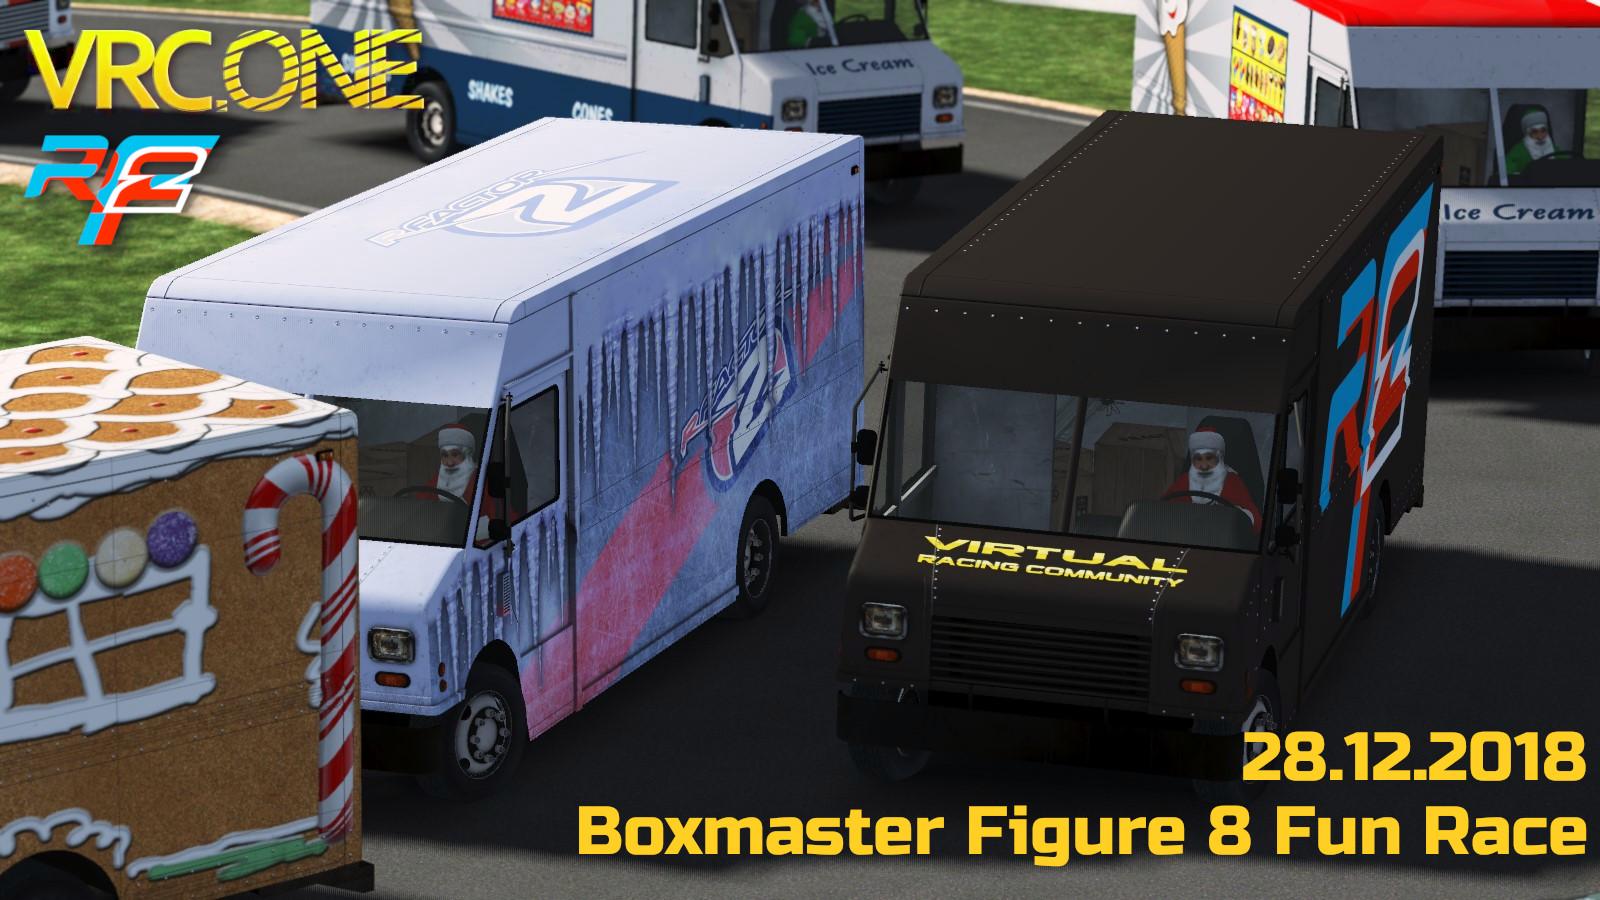 Boxmaster Figure 8 Fun Race